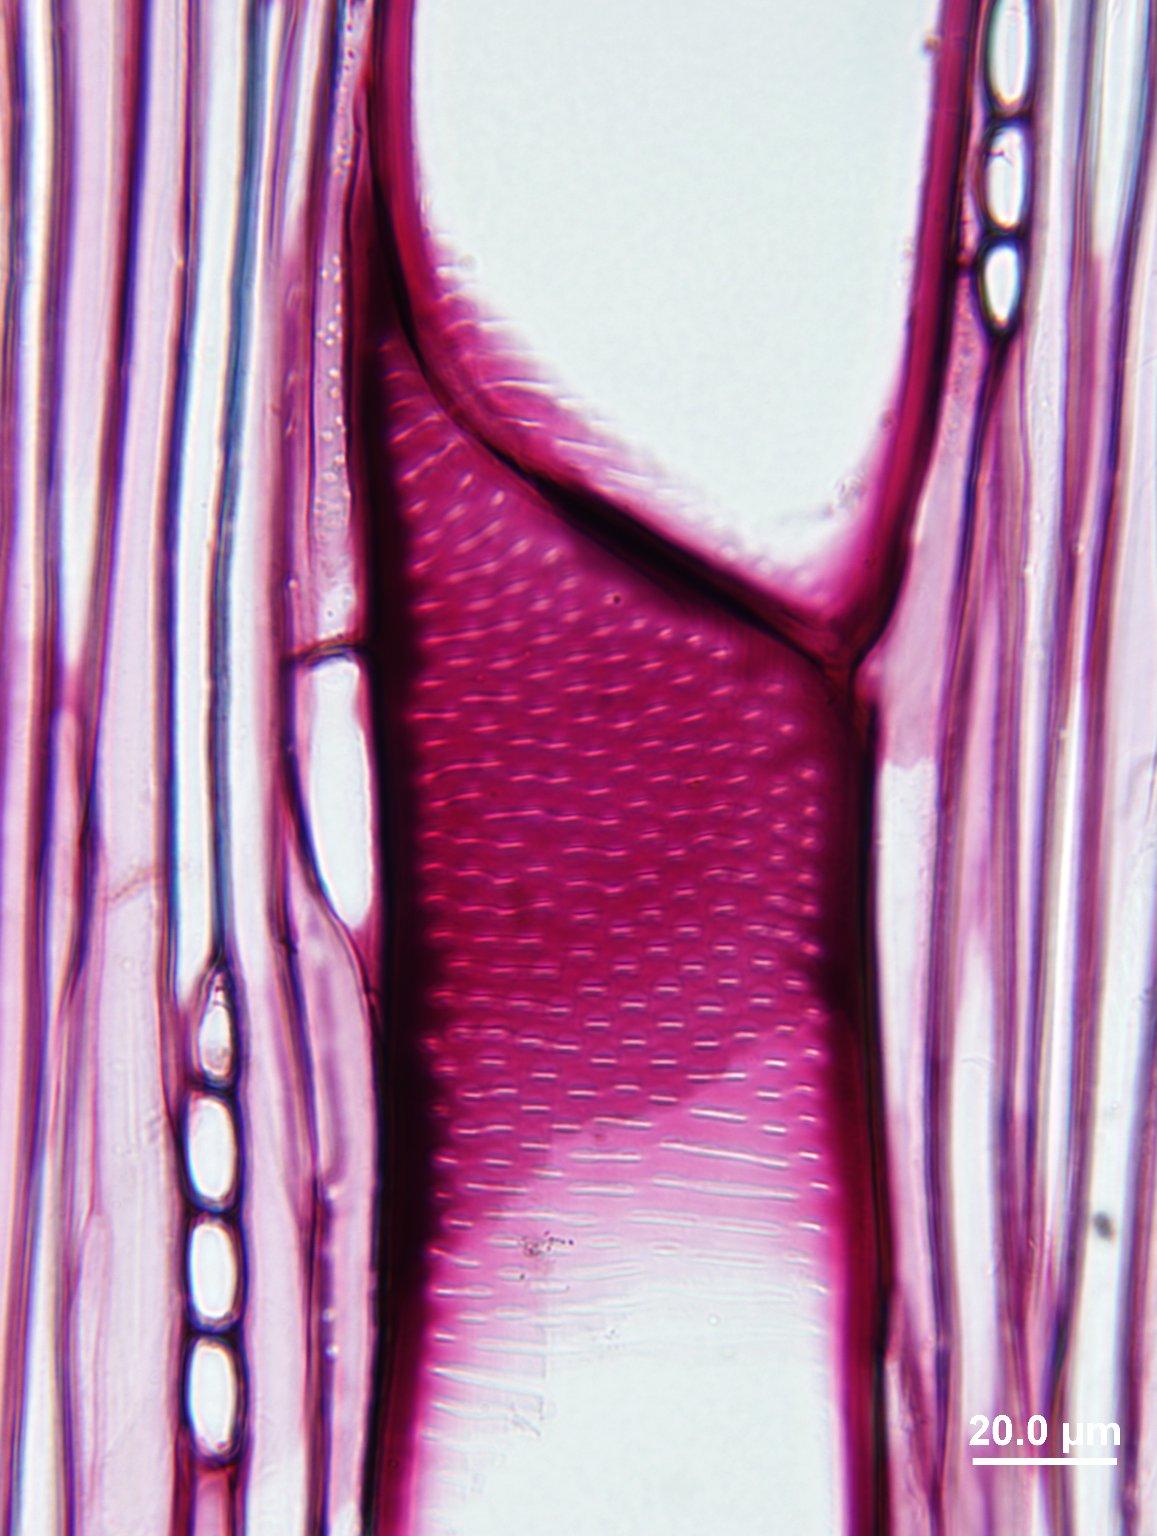 RUTACEAE Zanthoxylum piperitum